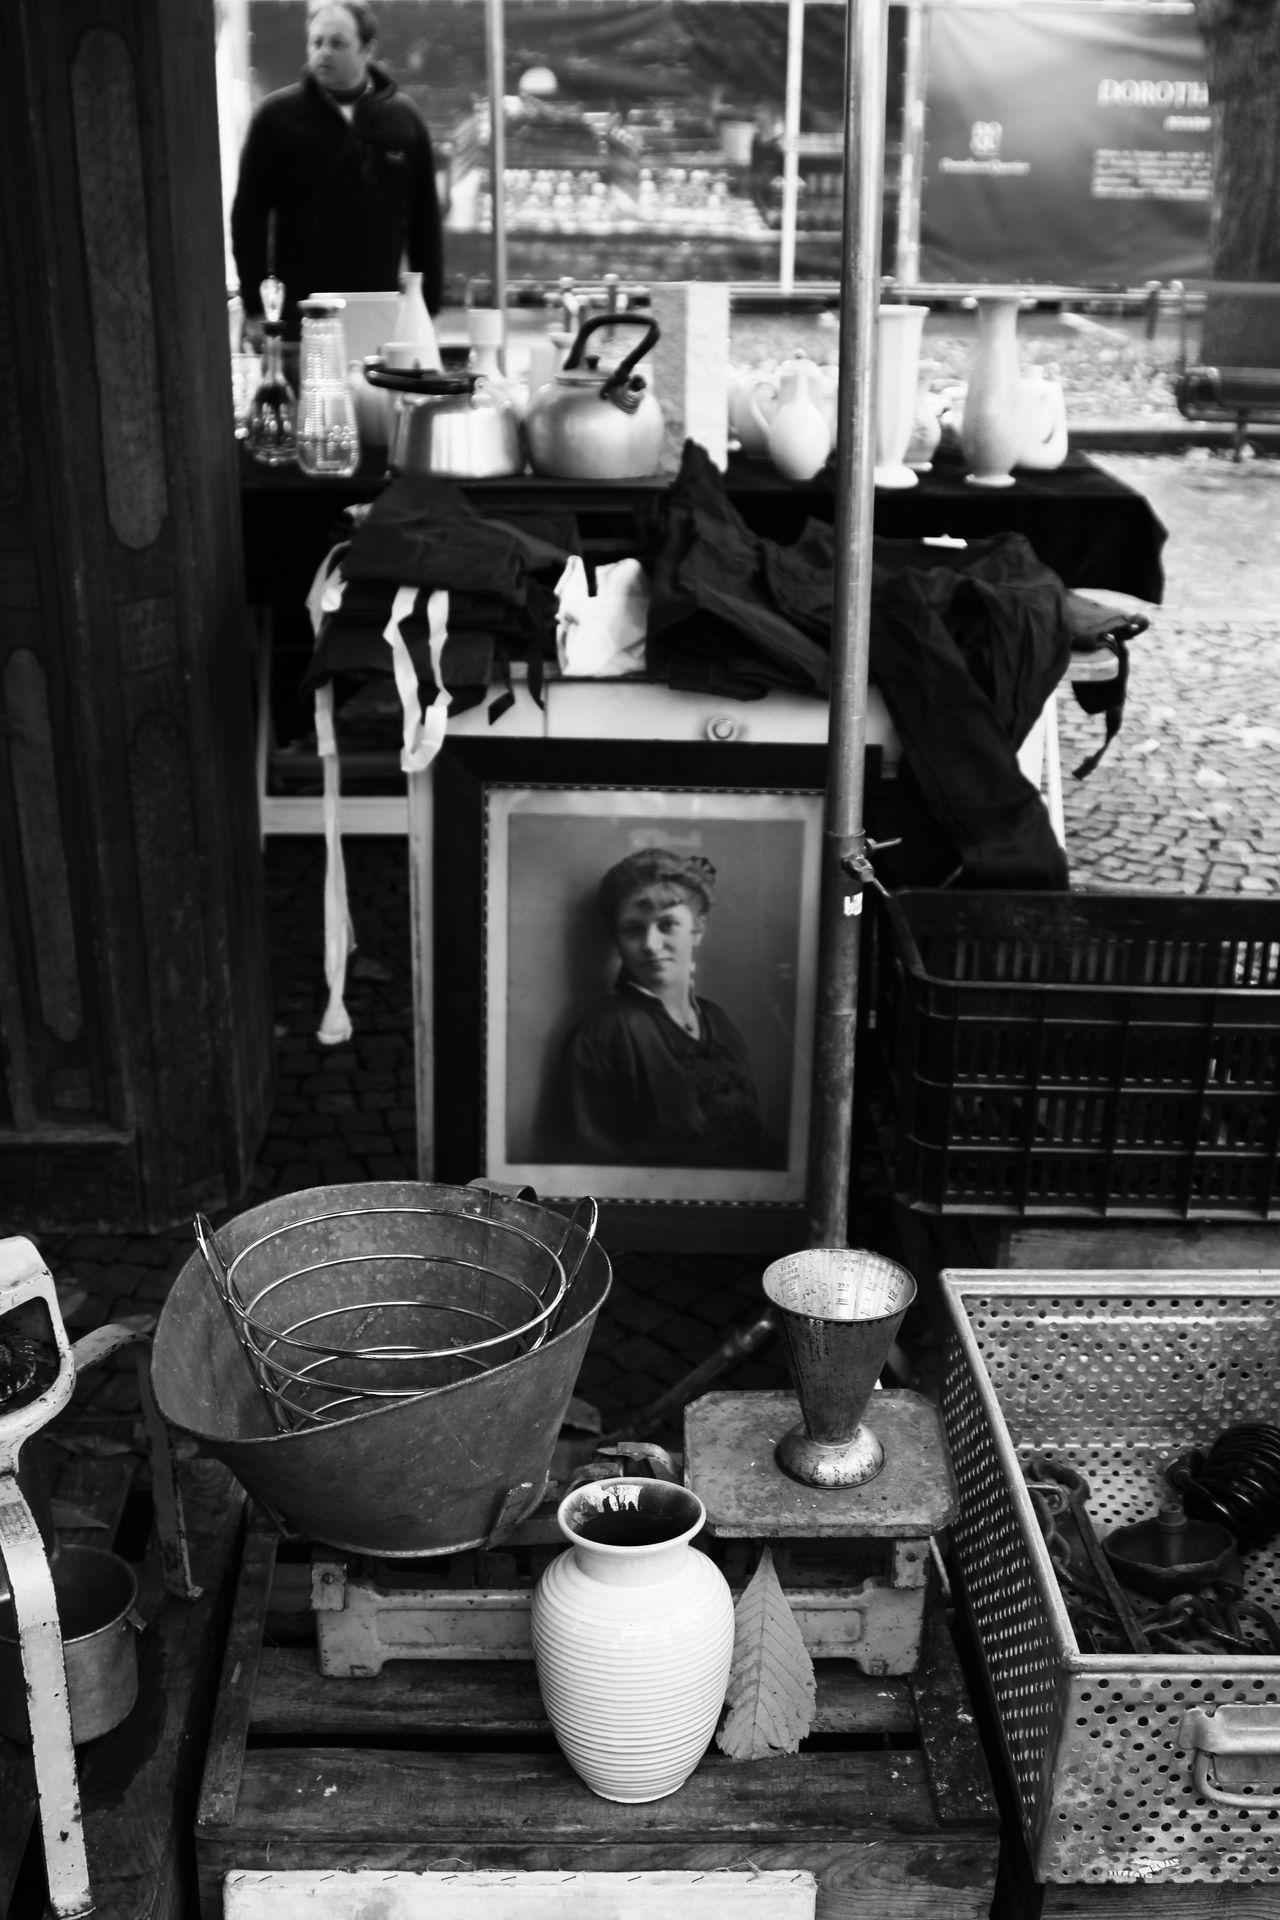 Black Black&white Blackandwhite Blackandwhite Photography Canon Canon_photos Canonphotography Flea Markets Fleamarket FleaMarketTreasure Portrait Streetphotography Vintage Vintagecollection